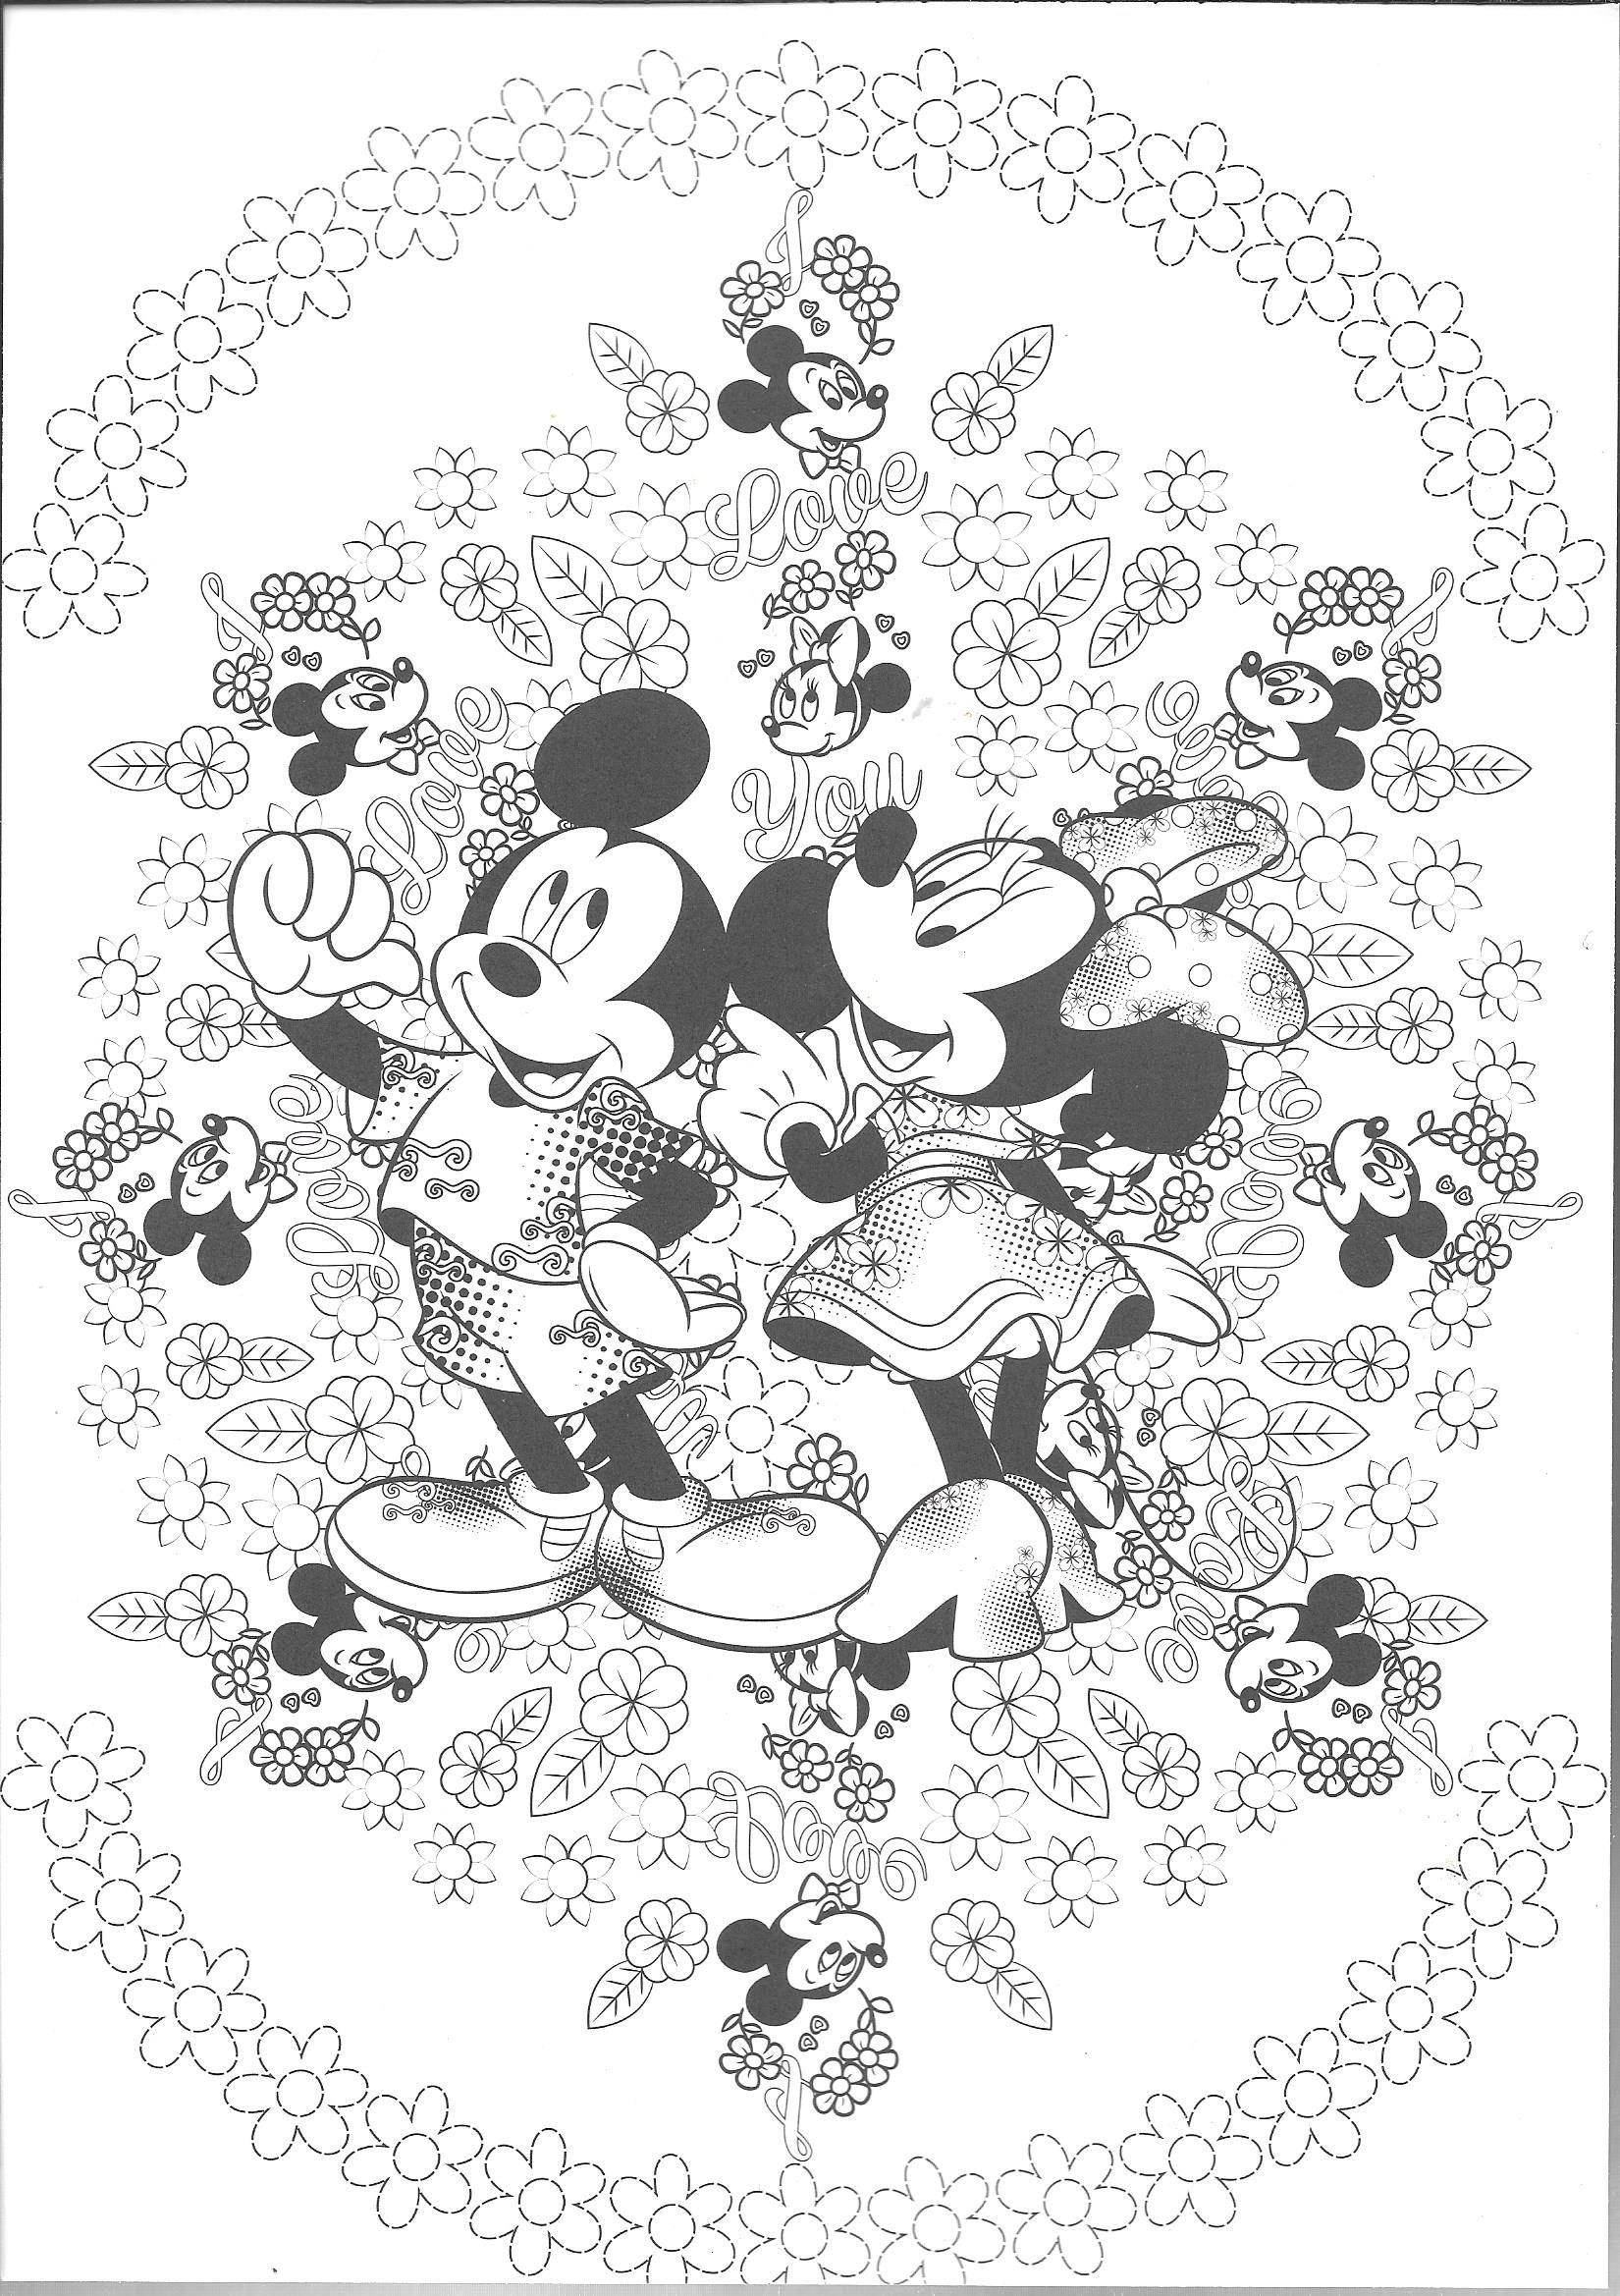 Pin By Mari Servin On Art Therapie Disney Coloring Pages Mickey Mouse Coloring Pages Coloring Pages [ 2338 x 1650 Pixel ]